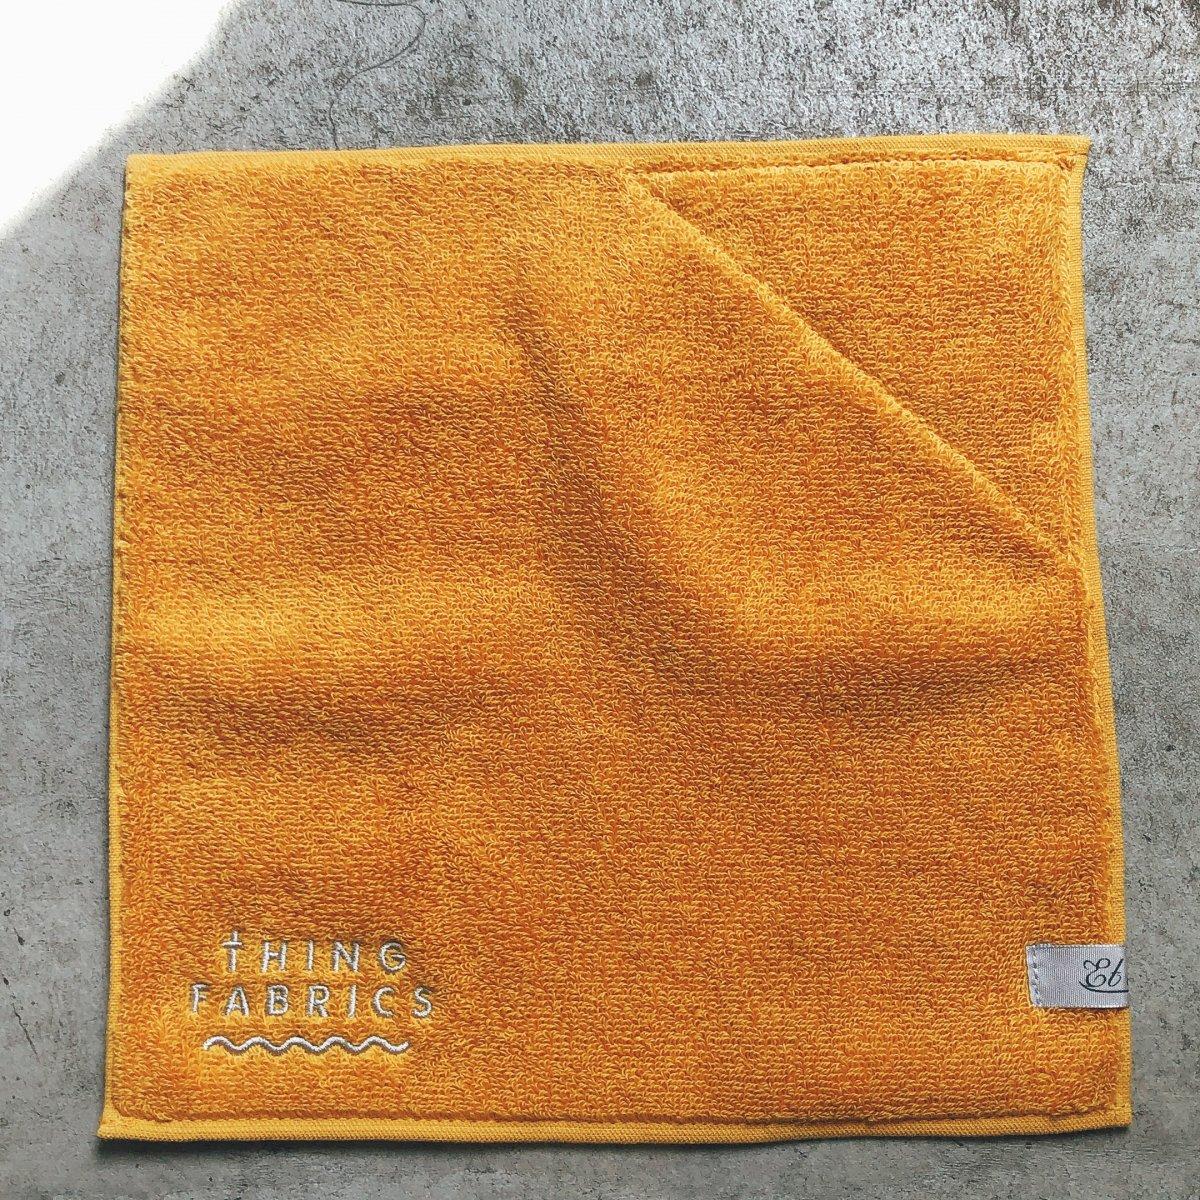 Et baas × THING FABRICS Pile HAND TOWL 詳細画像3